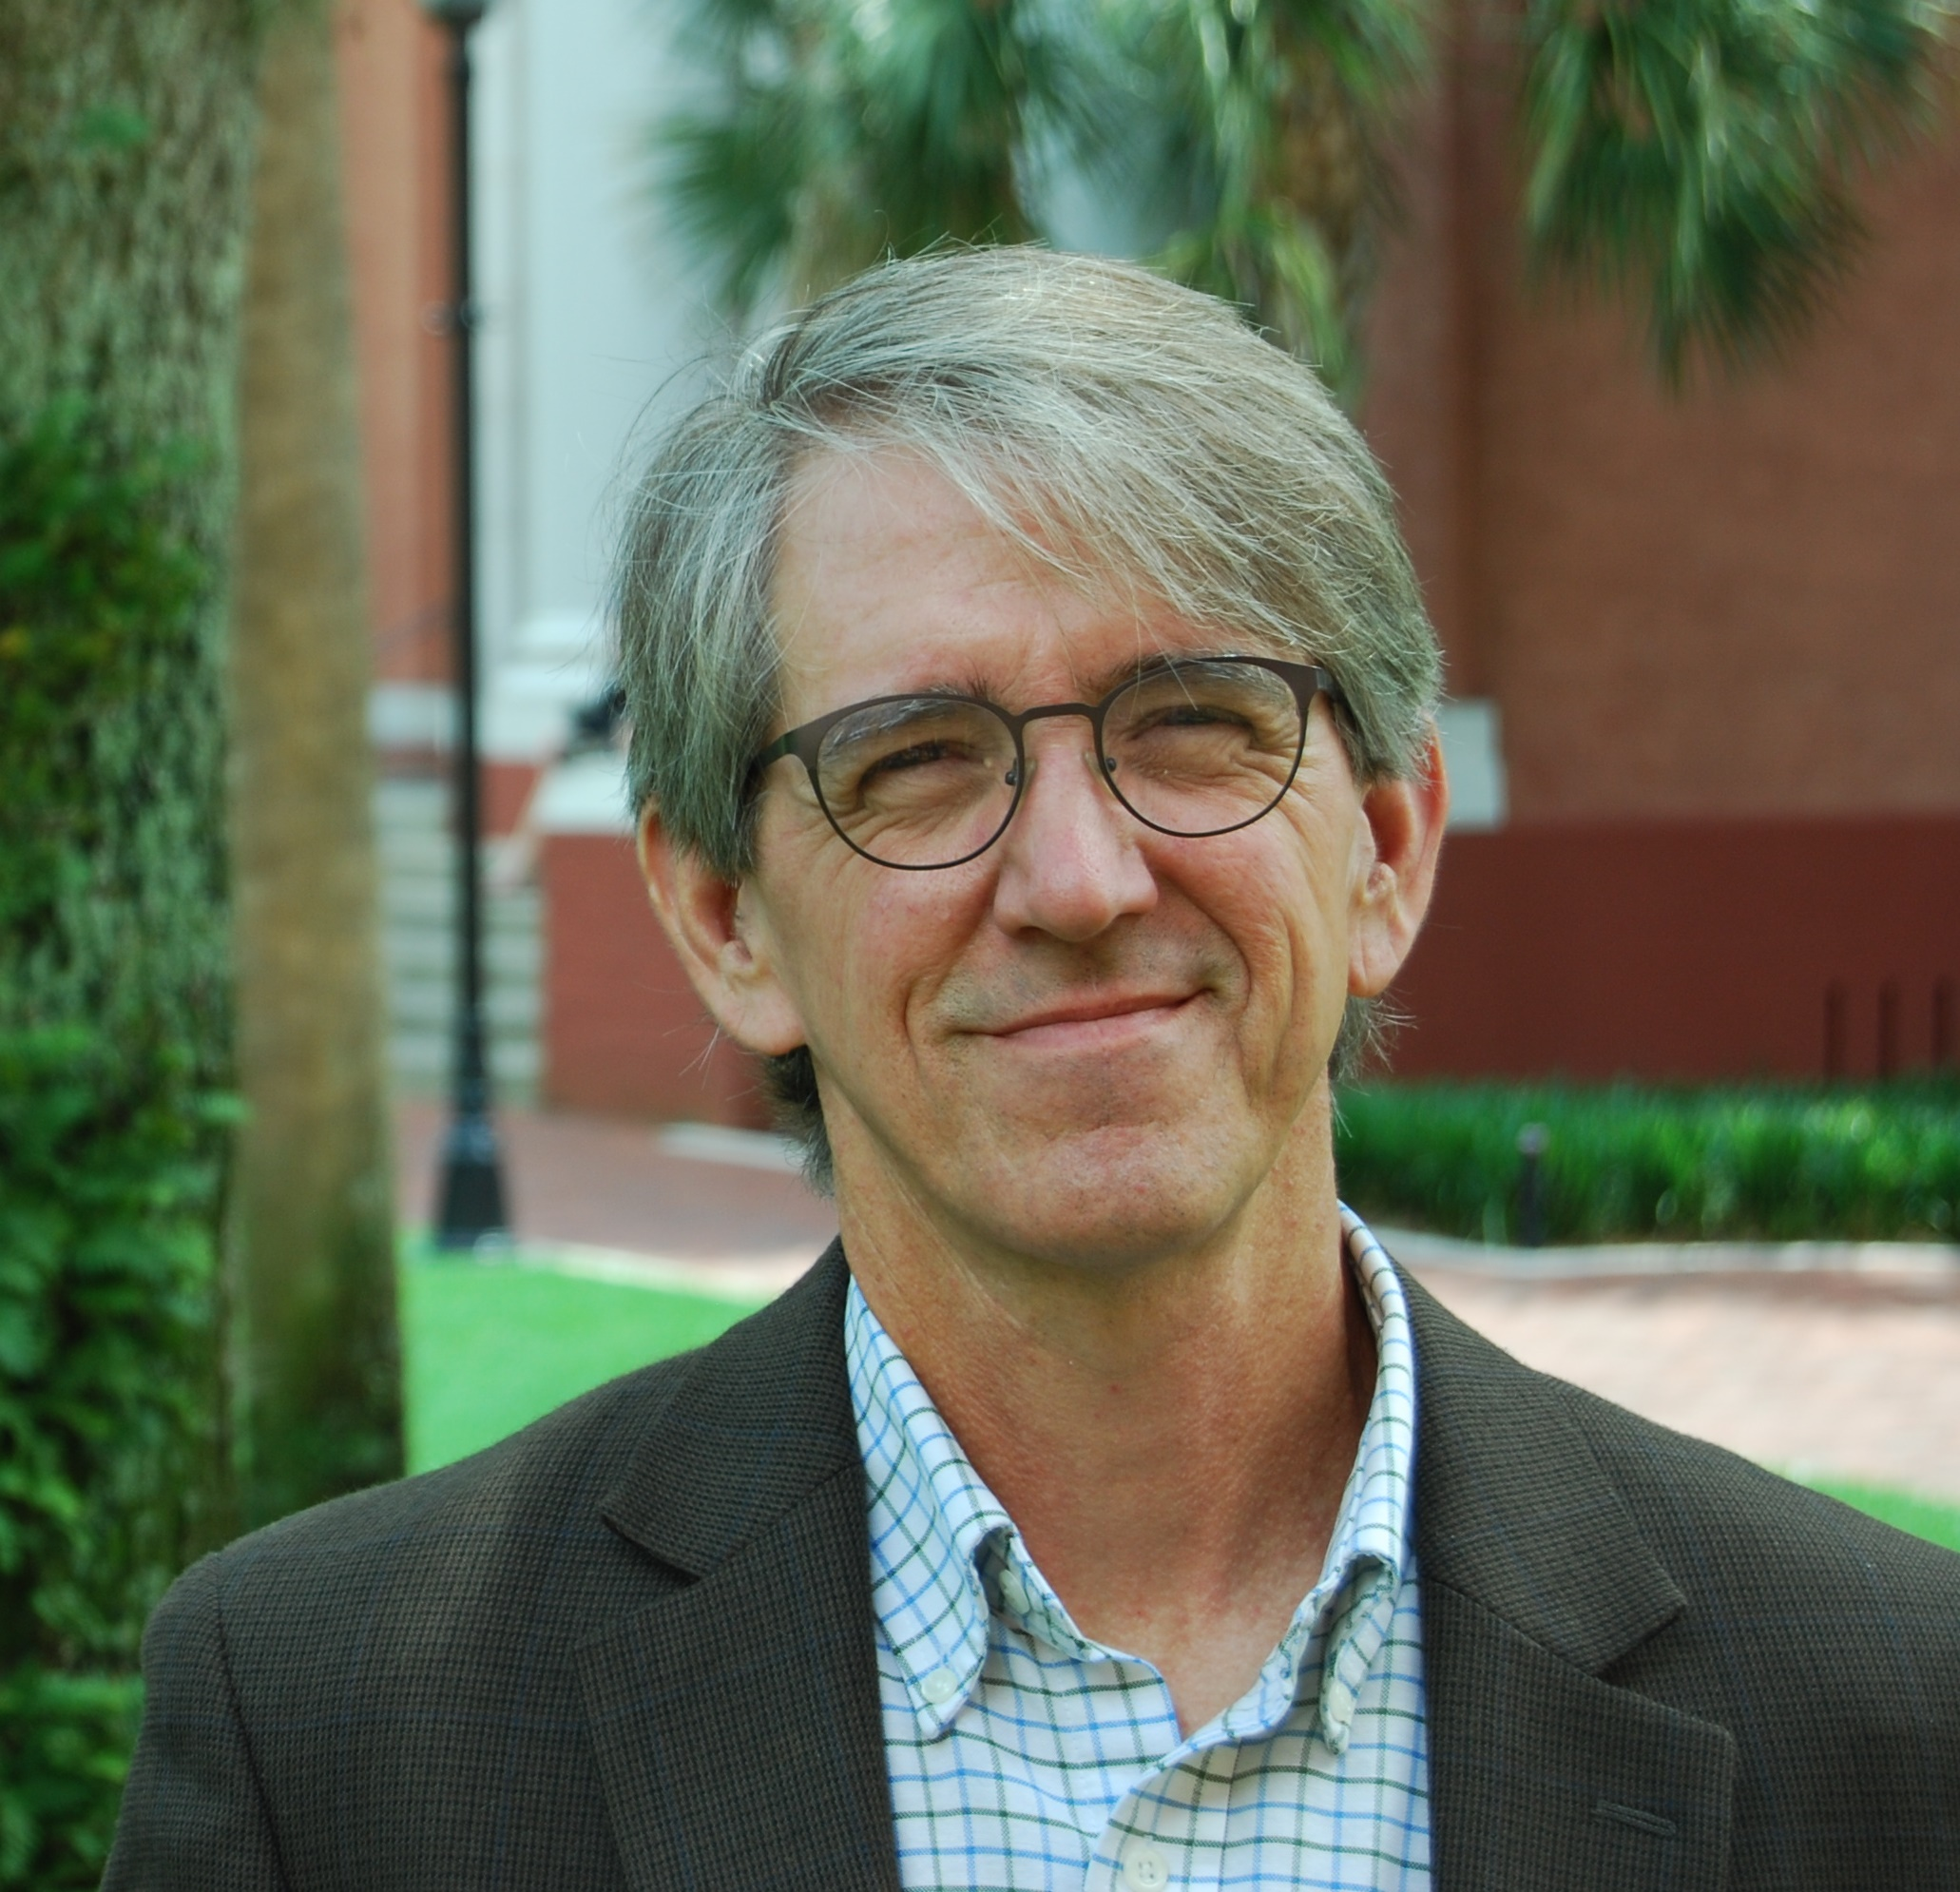 美国奥本大学教授DavidHill